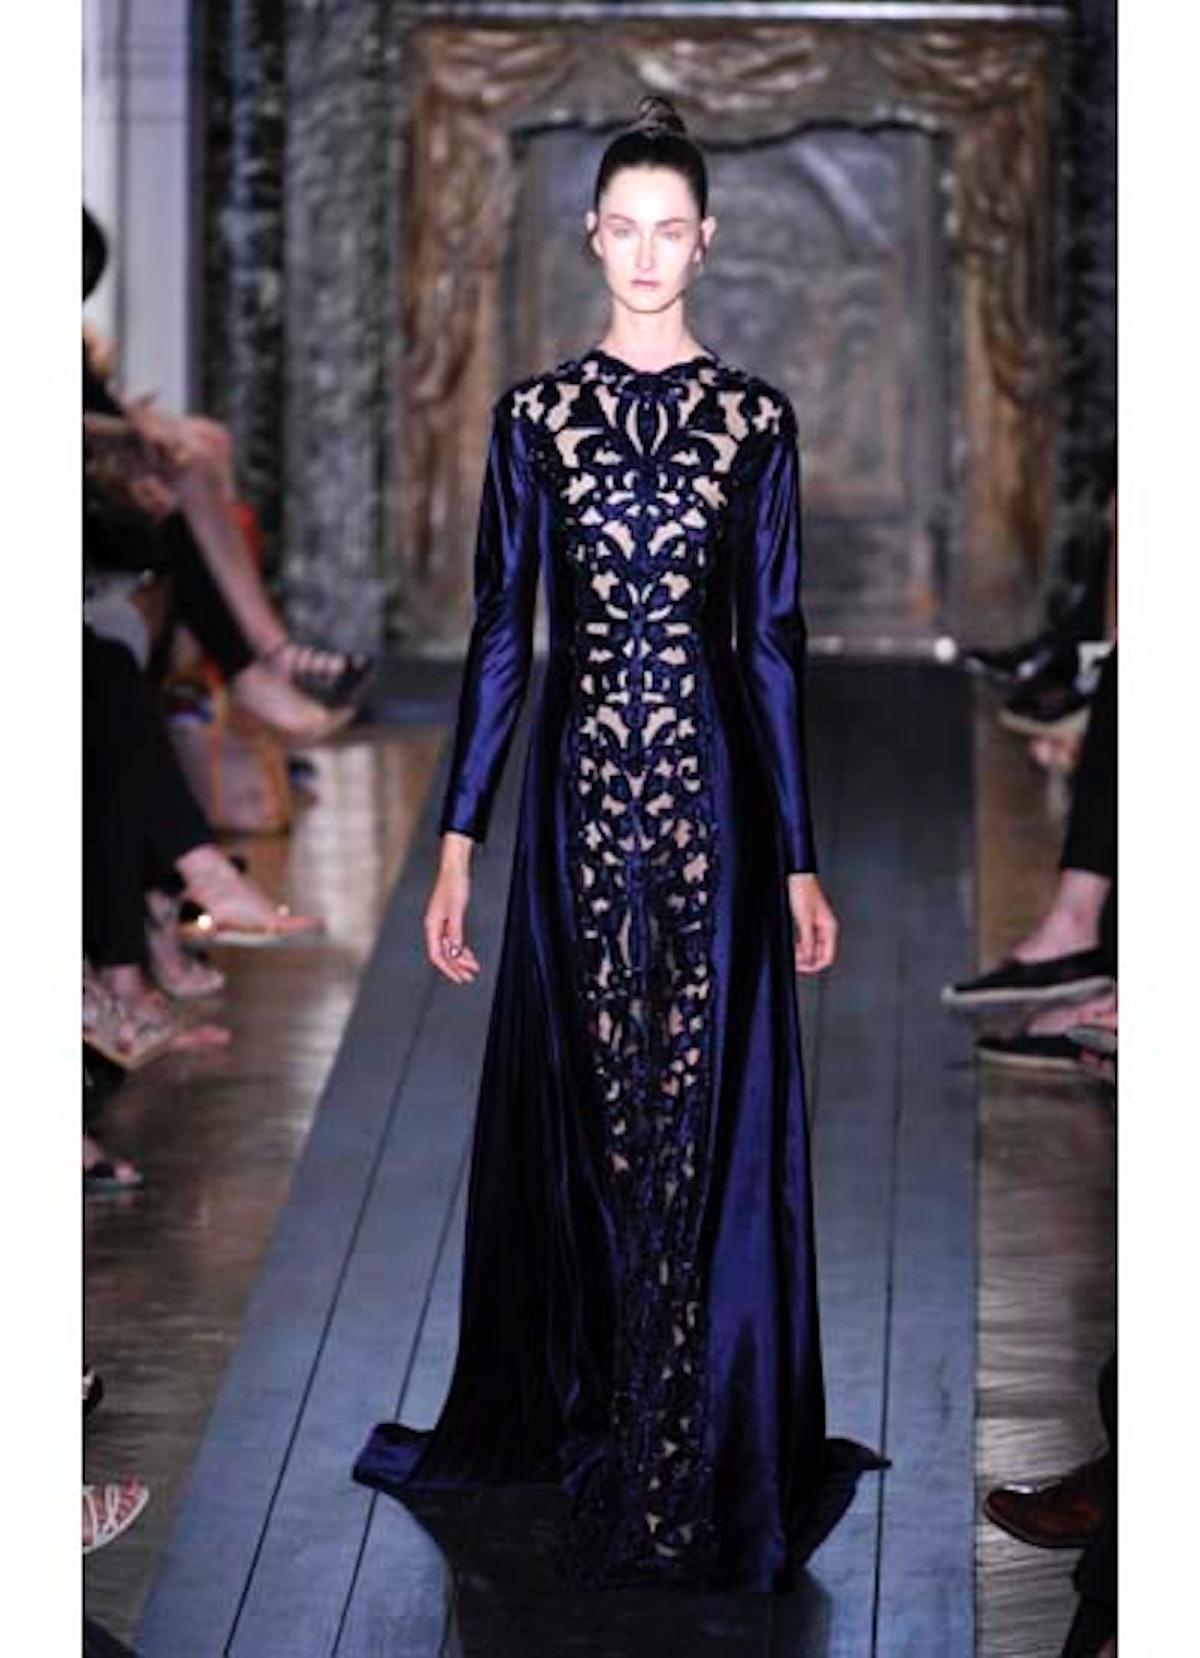 fass-valentino-couture-2012-runway-45-v.jpg